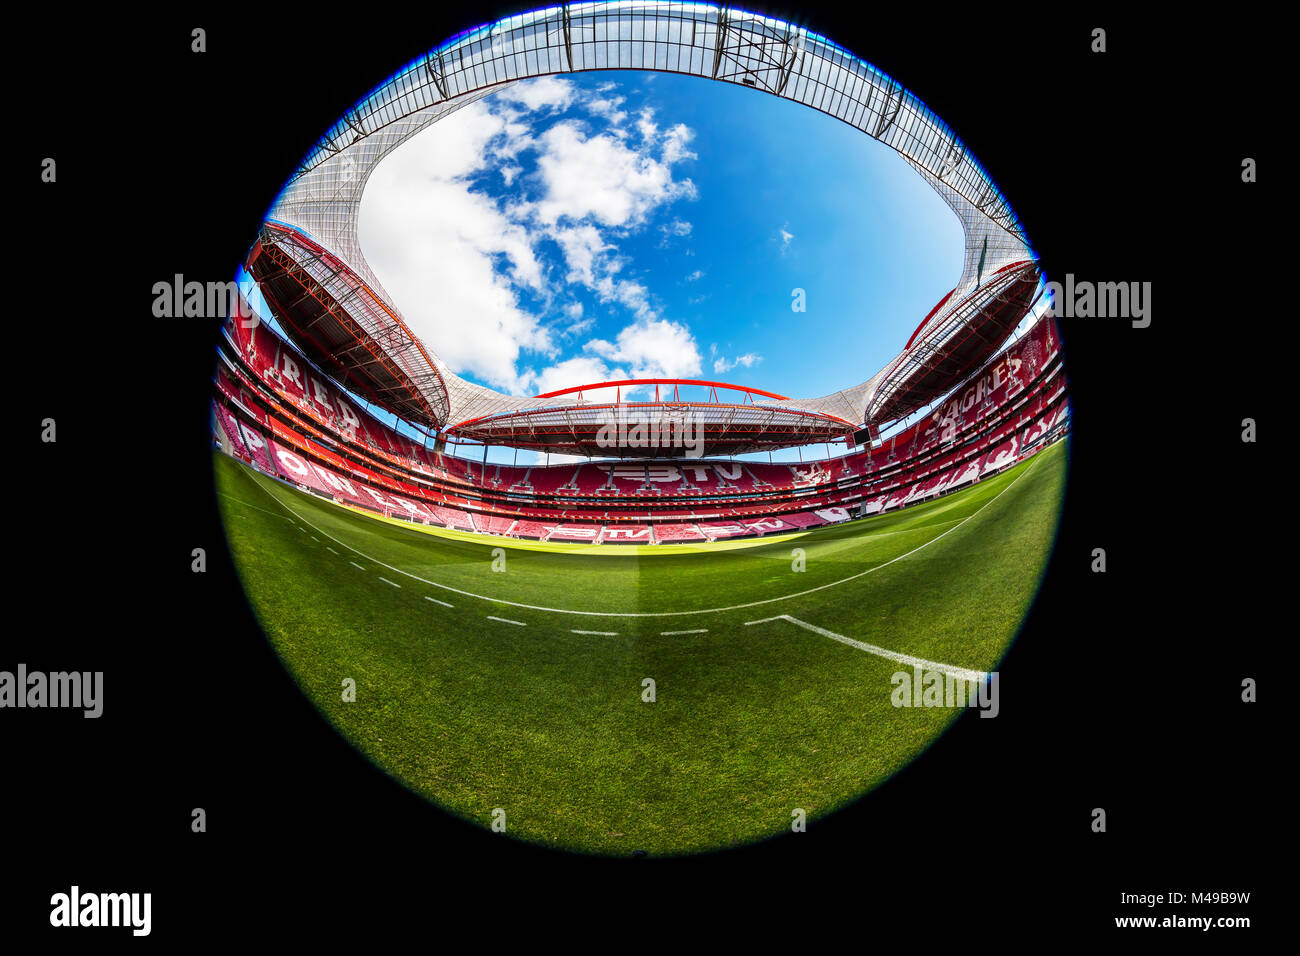 Sport Lisboa e Benfica, a Premier League Portuguese sports club based in Estádio da Luz in Lisbon, Portugal. - Stock Image